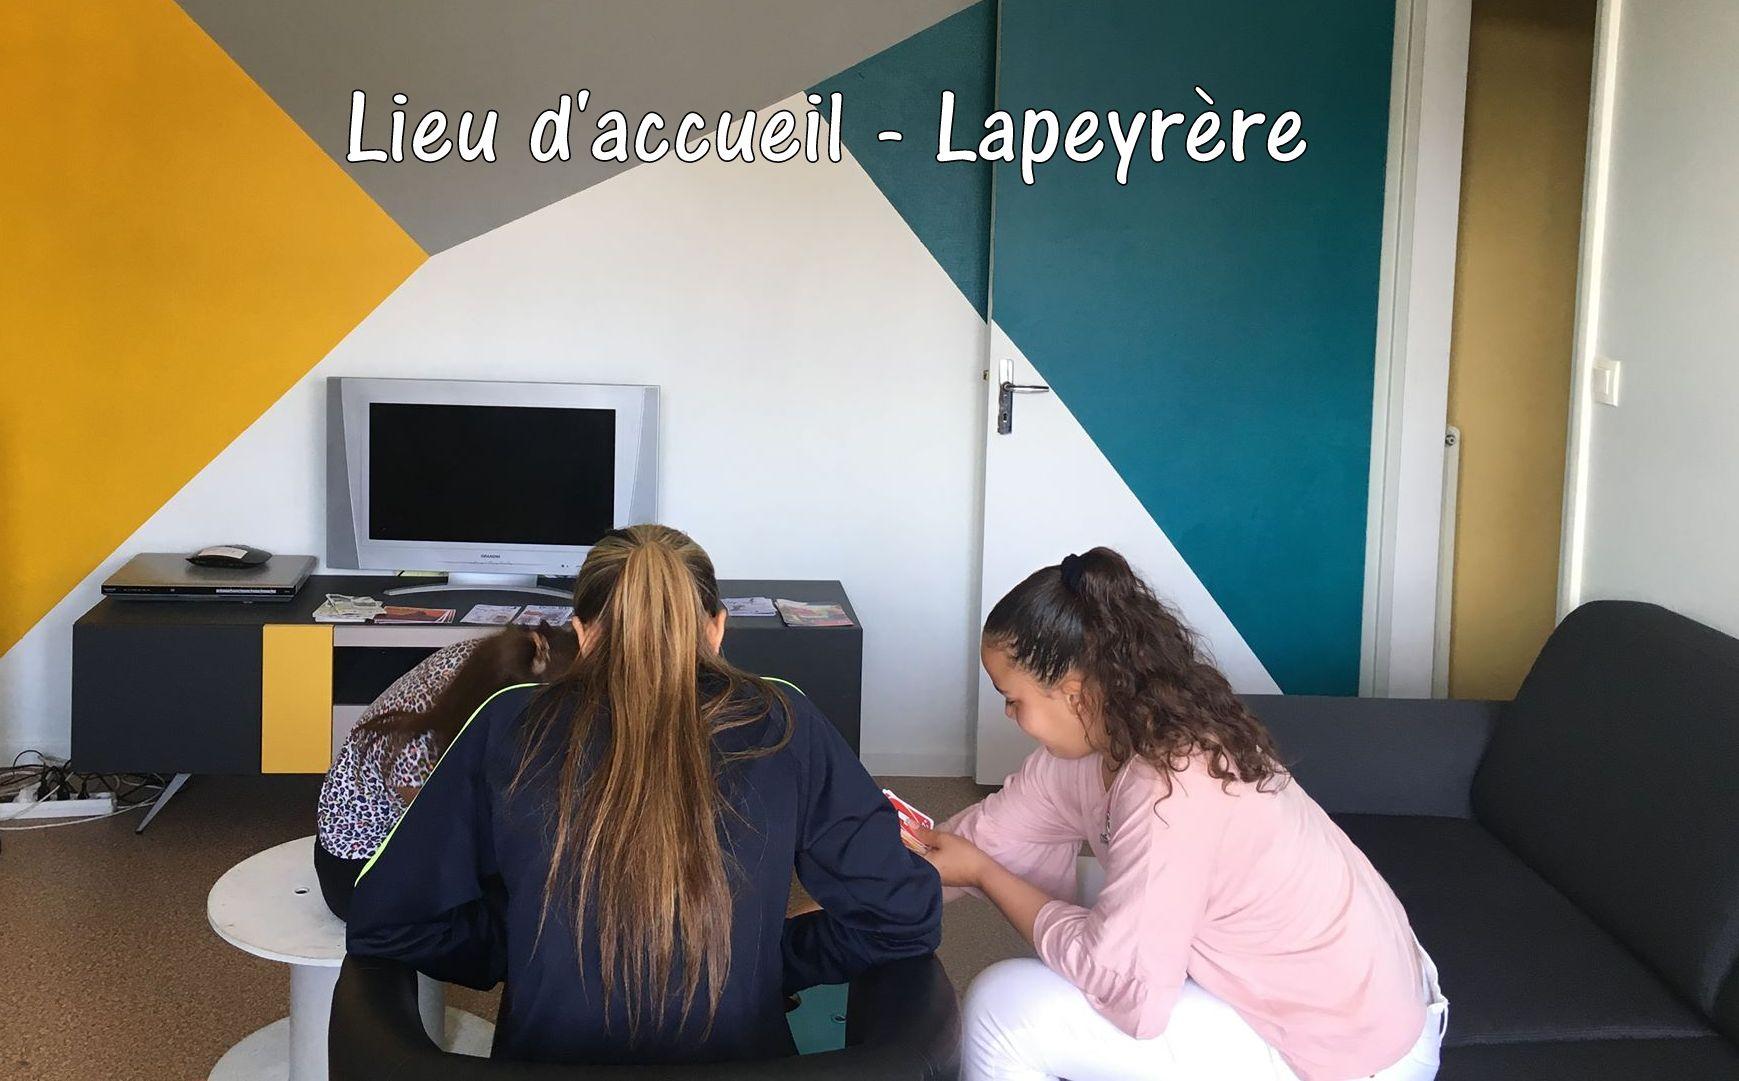 70accueil-Lapeyrere1